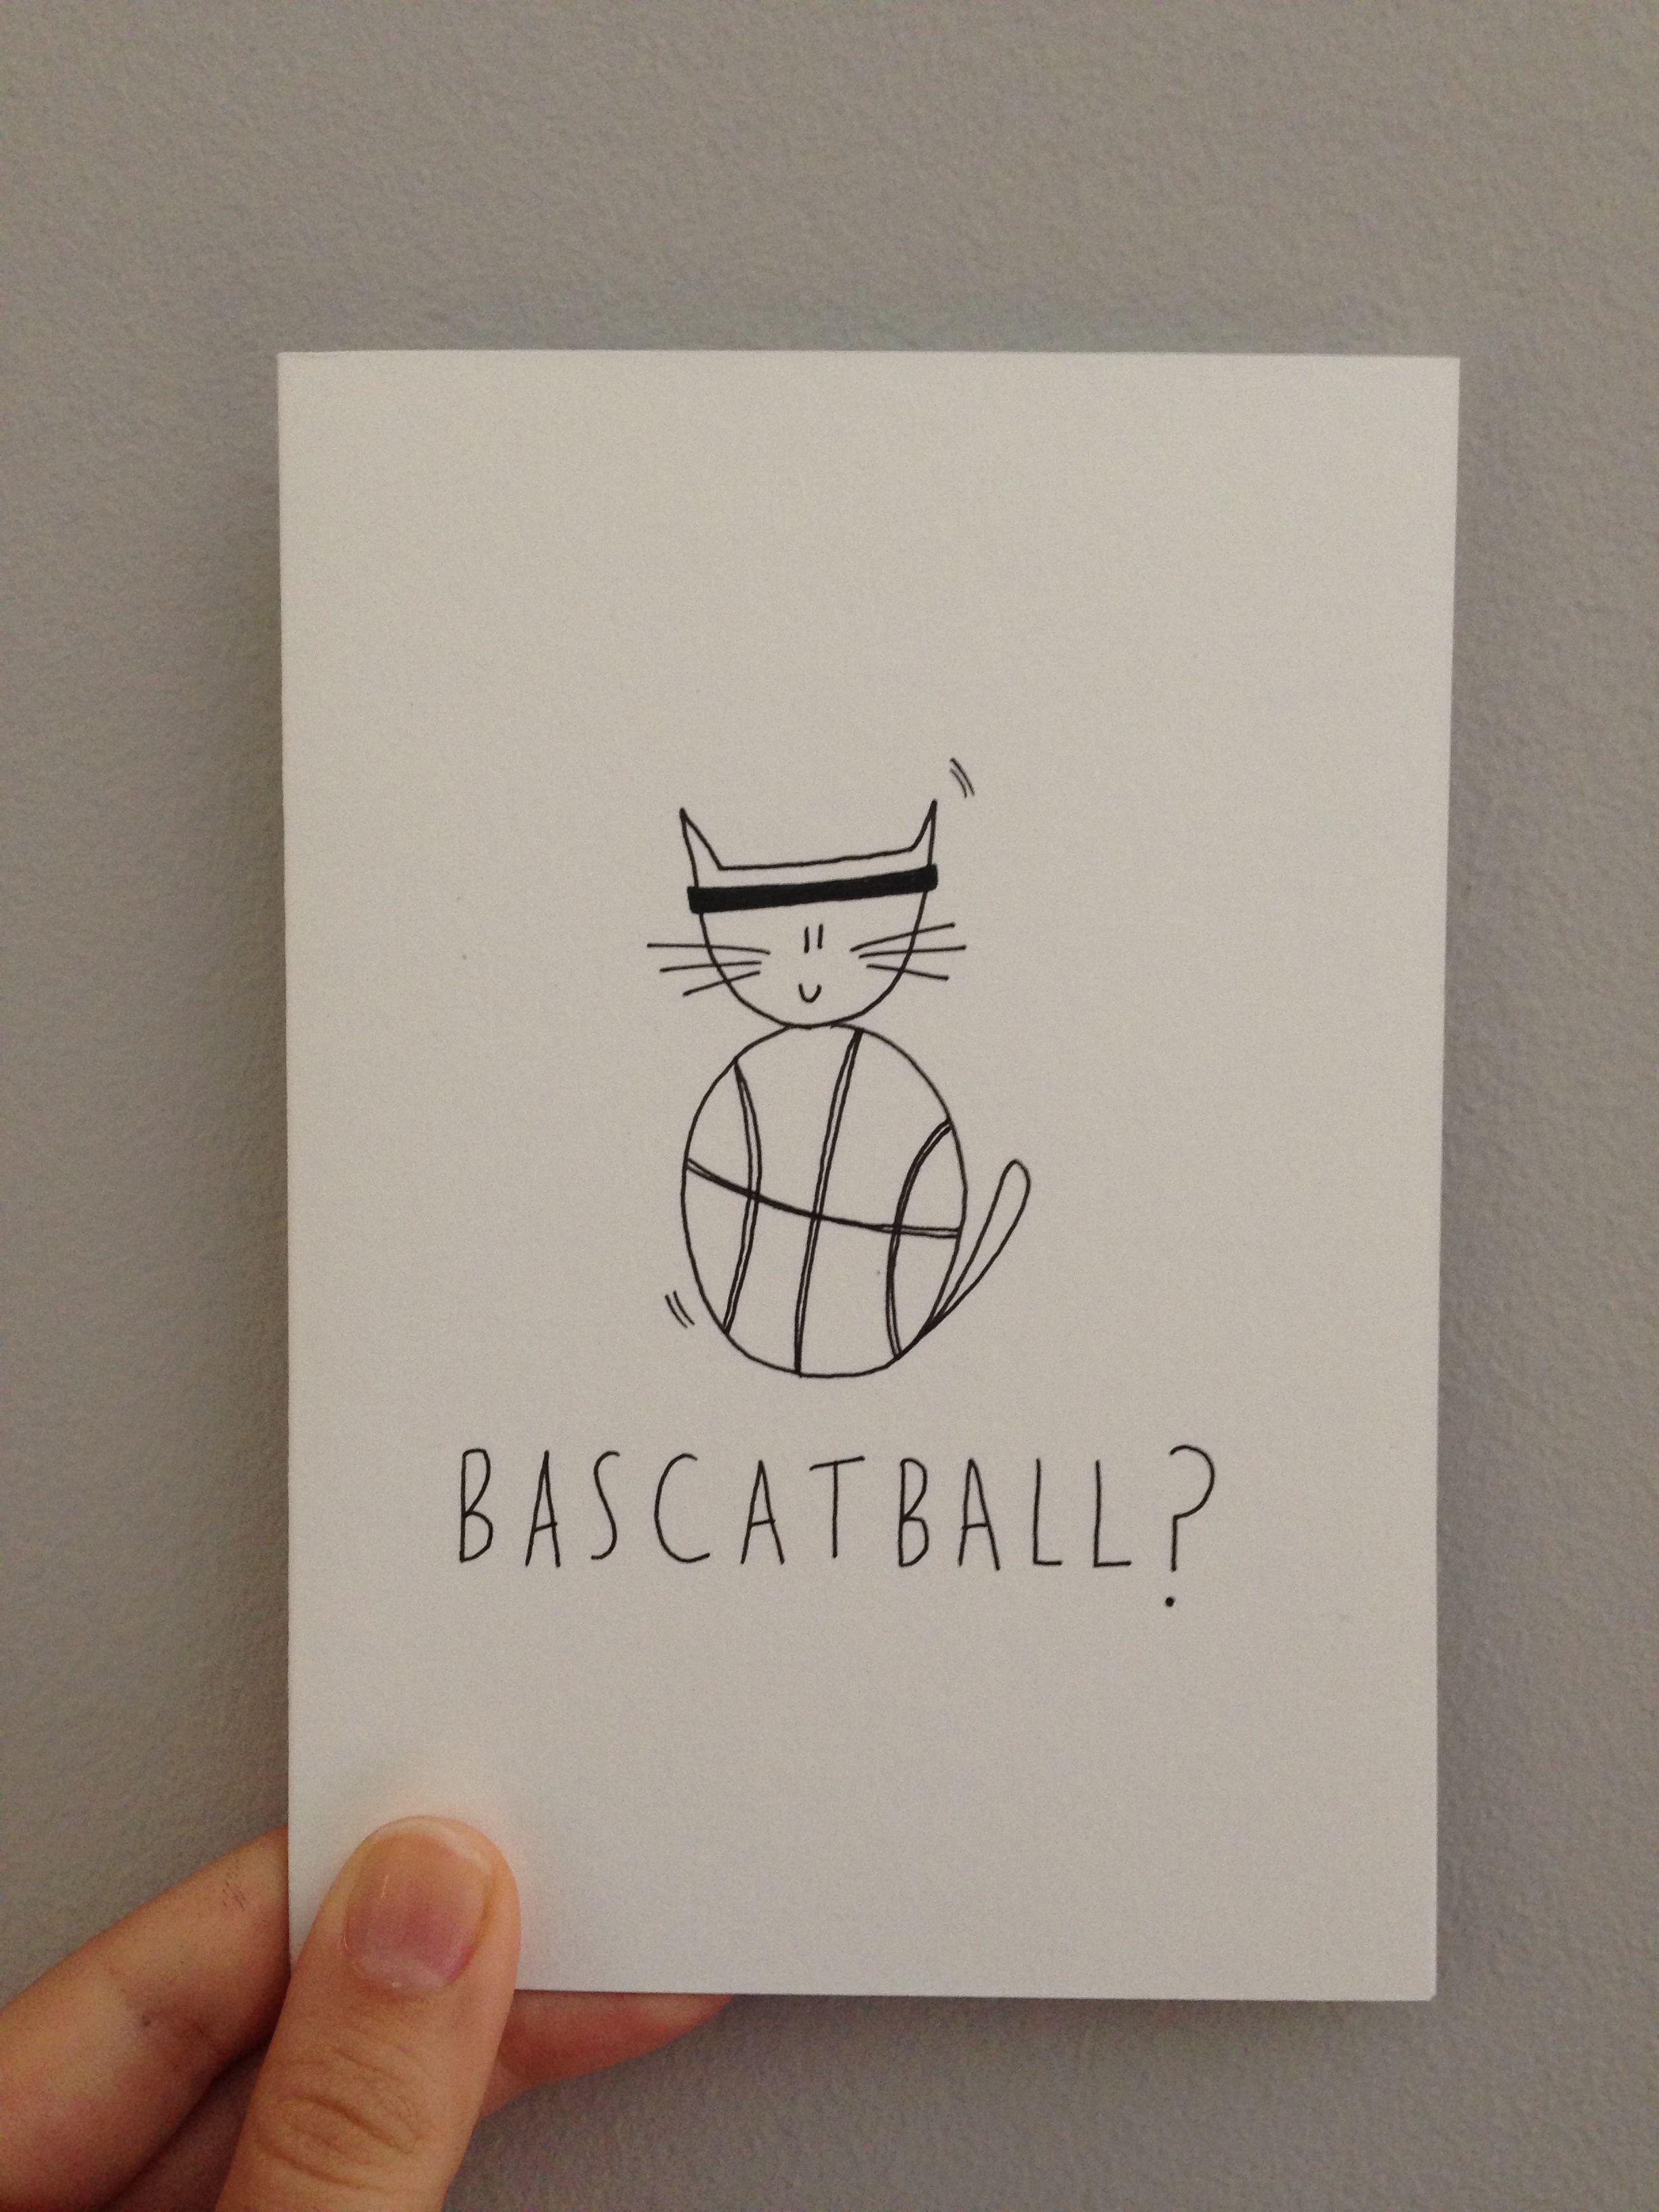 Custom made greeting card bascatball linseymouse linseymouse custom made greeting card bascatball linseymouse m4hsunfo